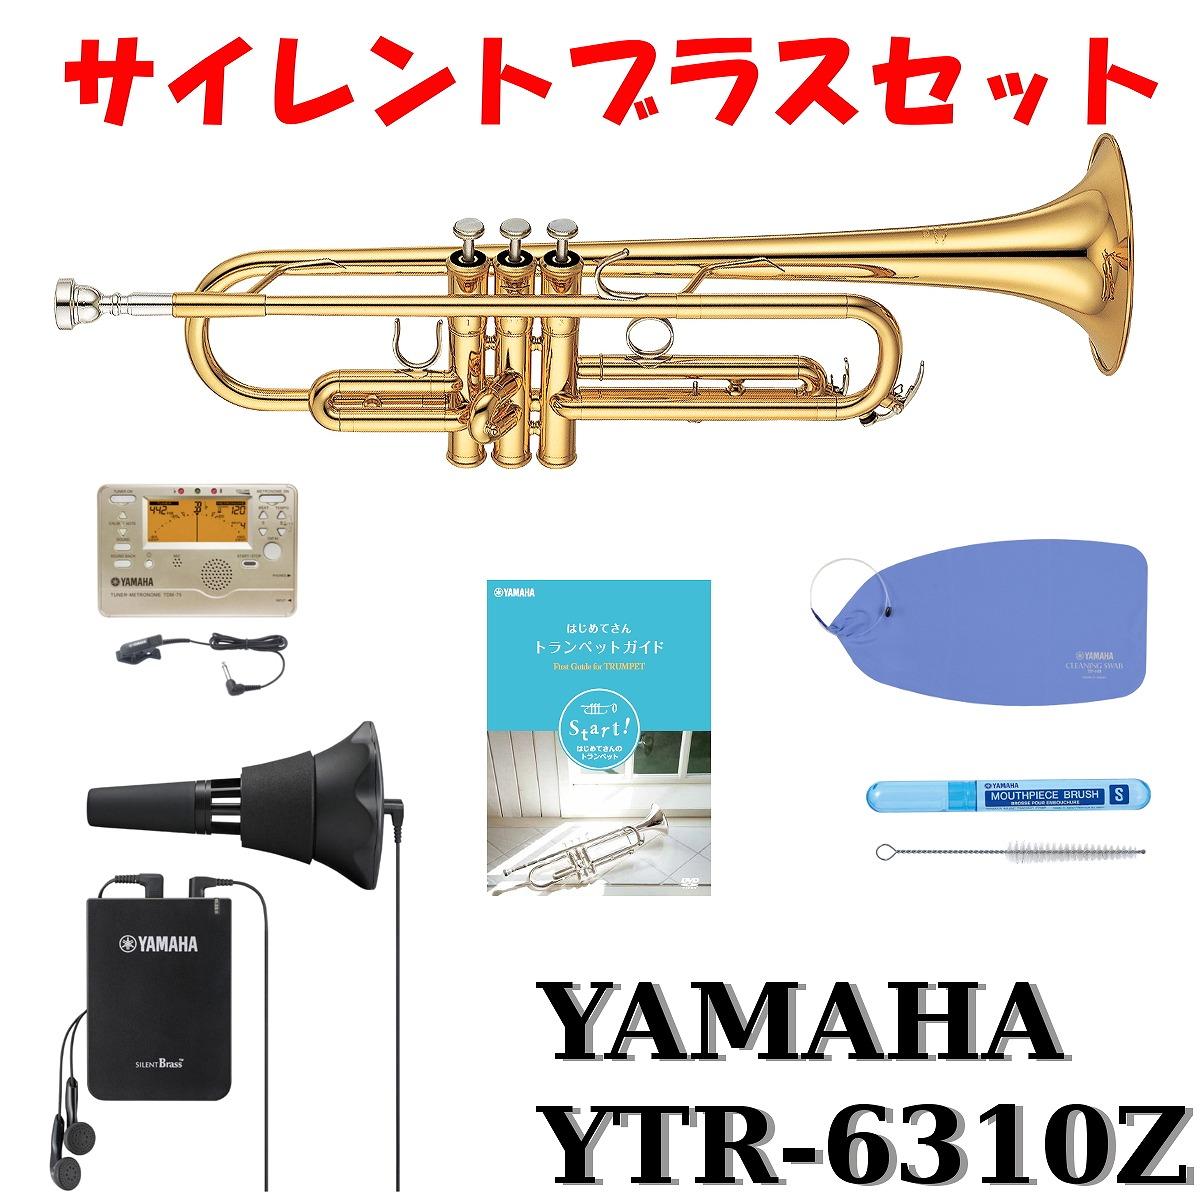 YAMAHA YTR-6310Z ヤマハ トランペット サイレントブラス【出荷前調整】【横浜店】